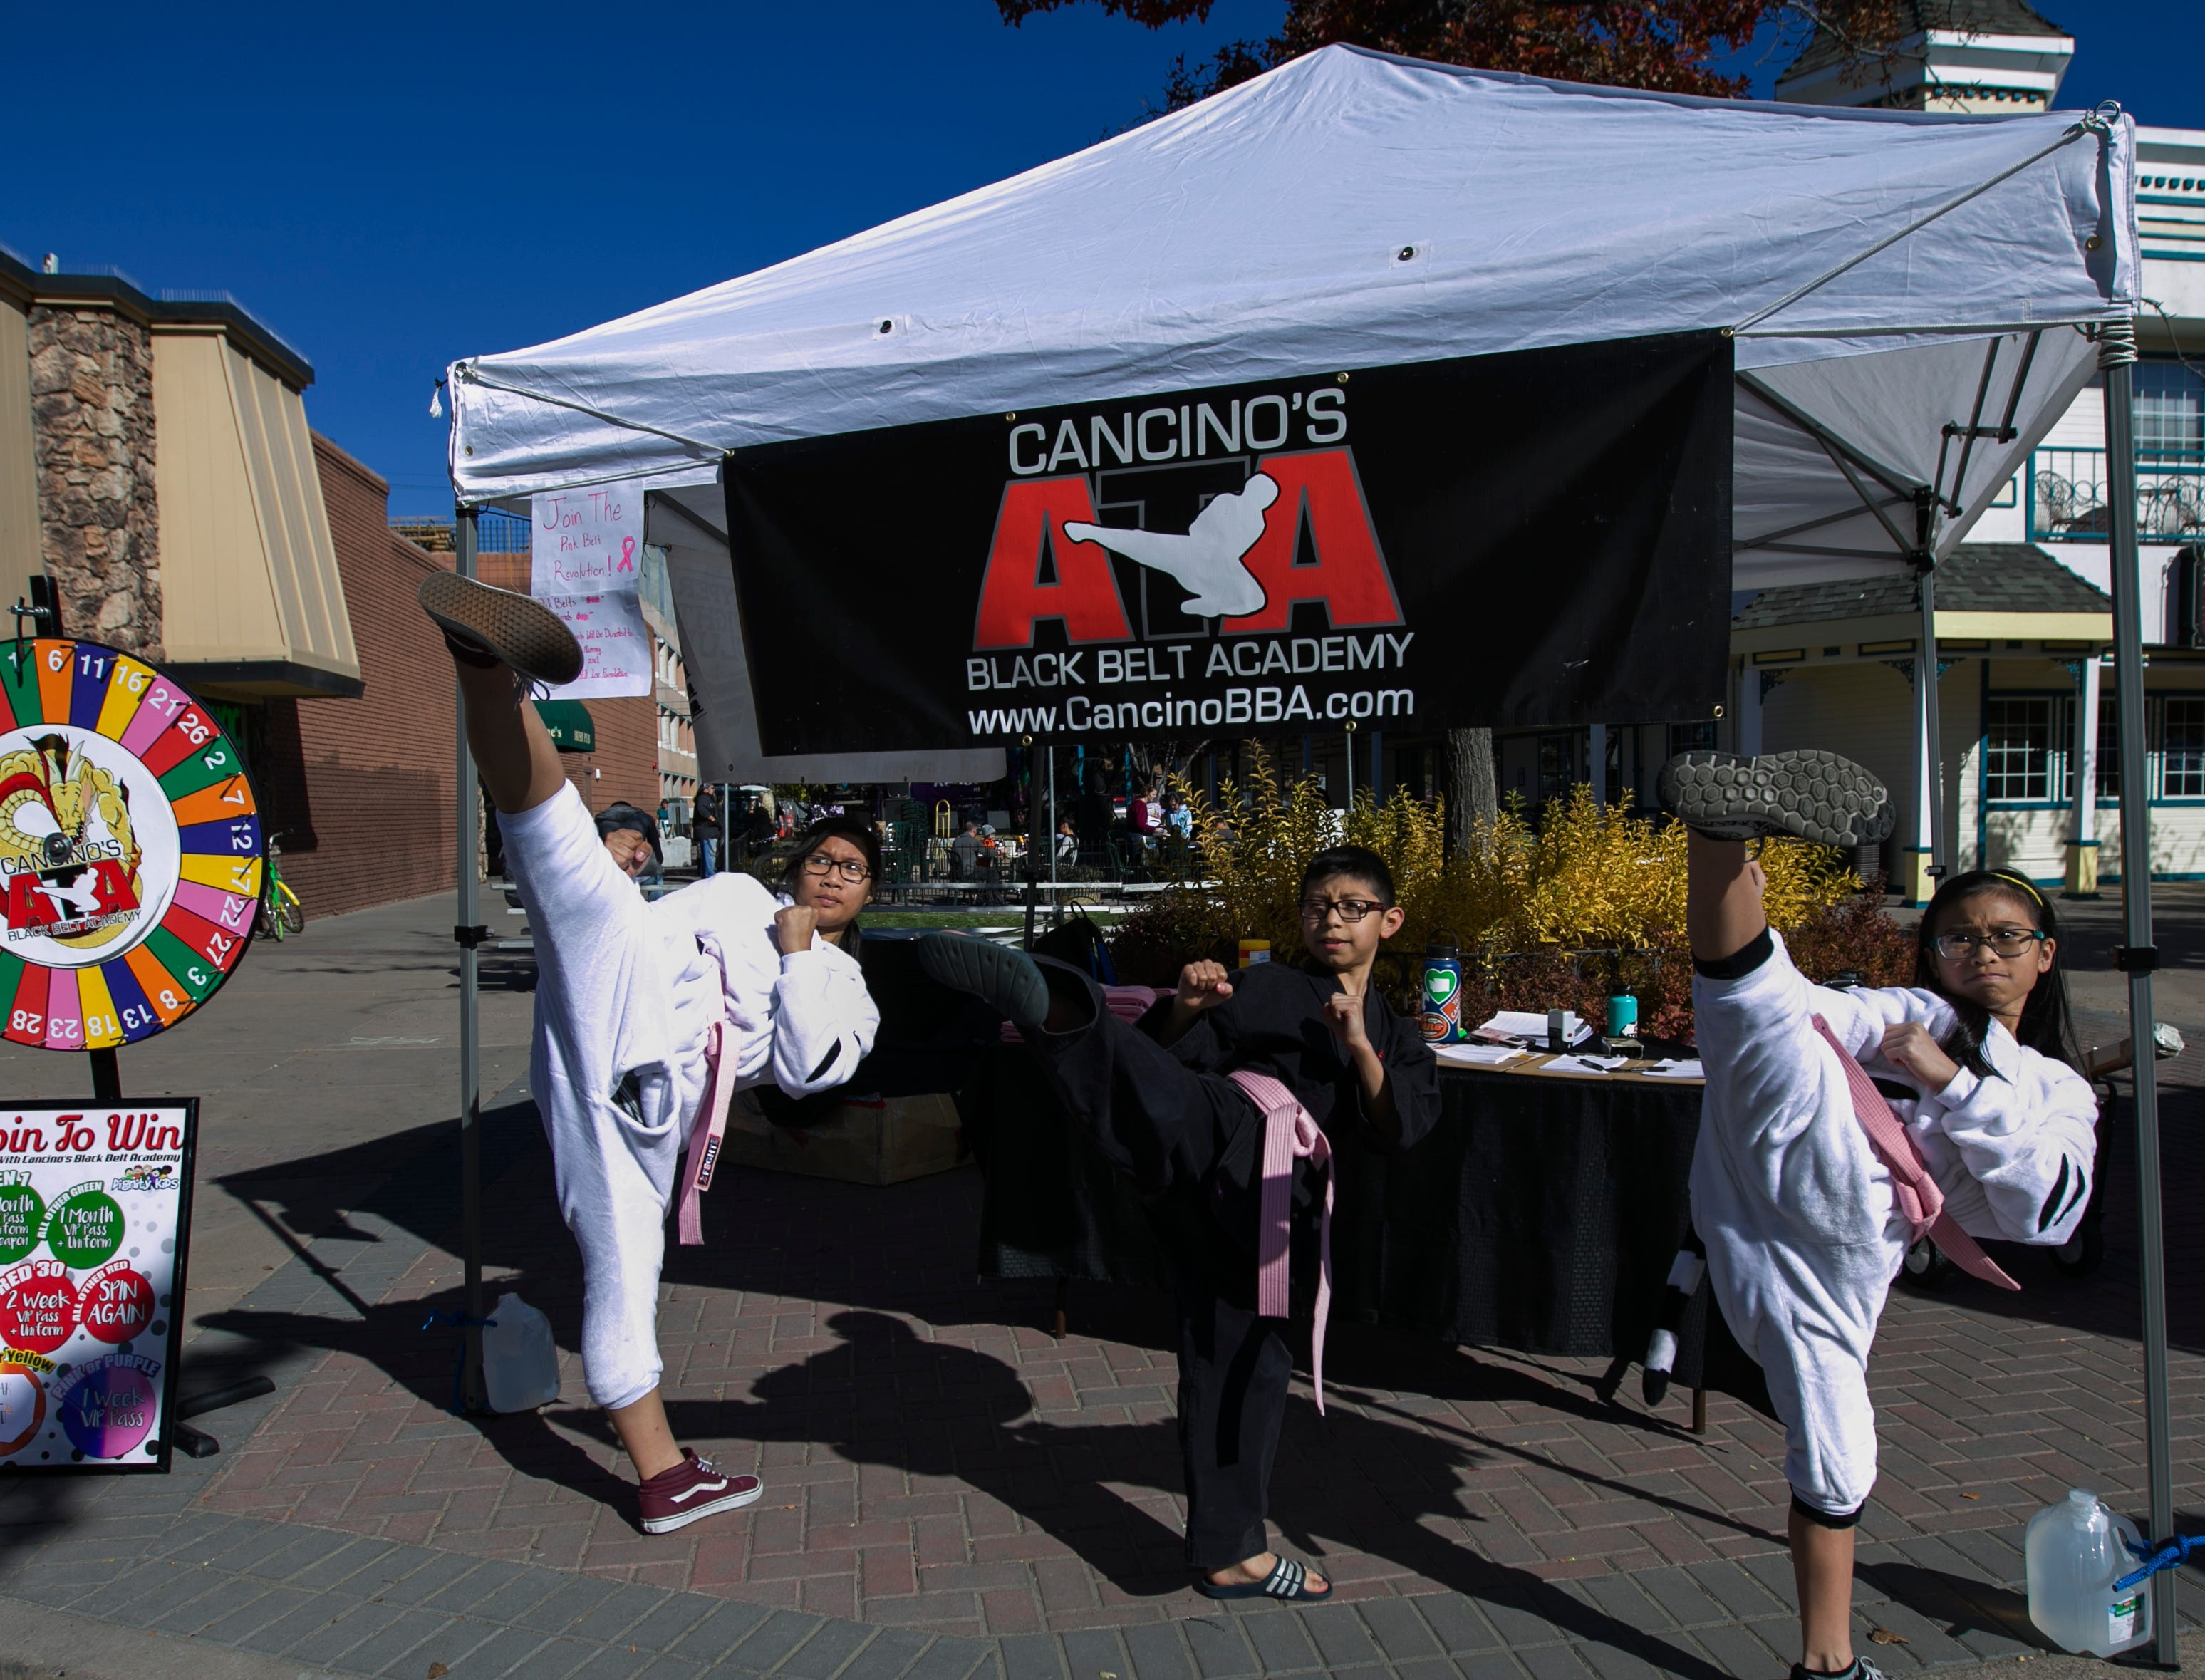 Cancinos Black Belt Academy during Pumpkin Palooza on Sunday Oct. 21, 2018 in Sparks, Nevada.